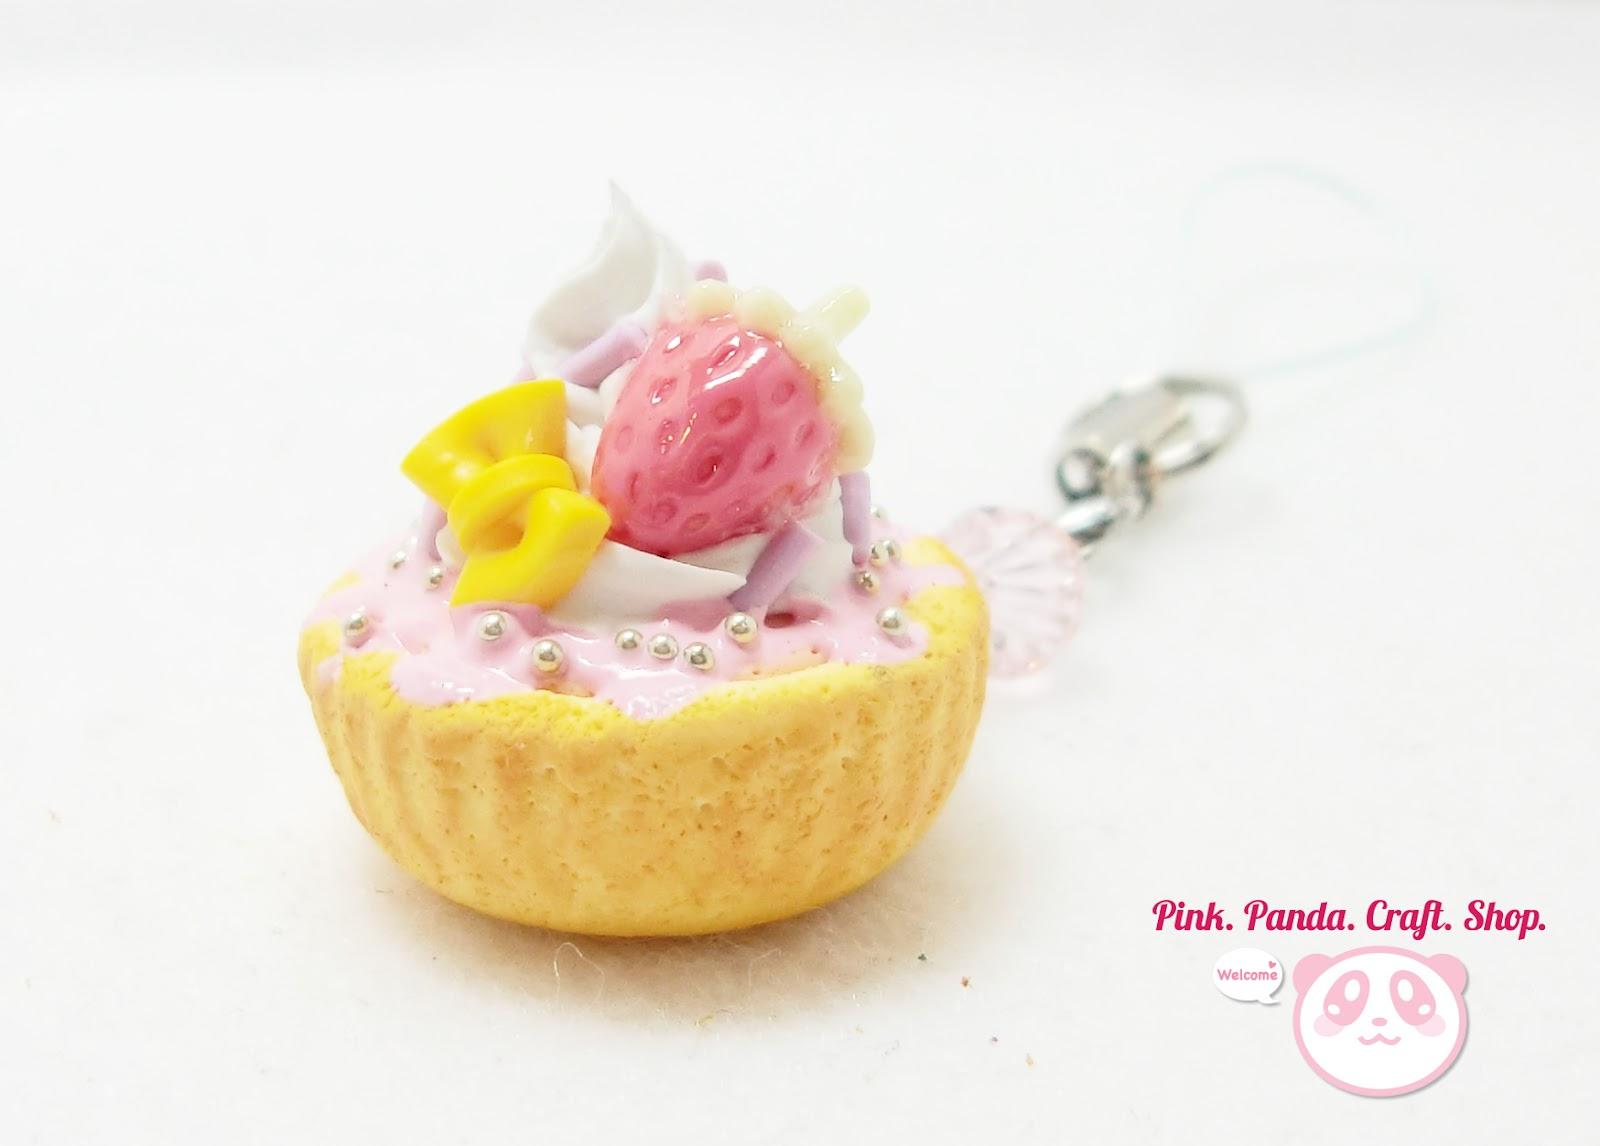 Pinkpandacraftshop New Polymer Clay Desserts For Craft Shows